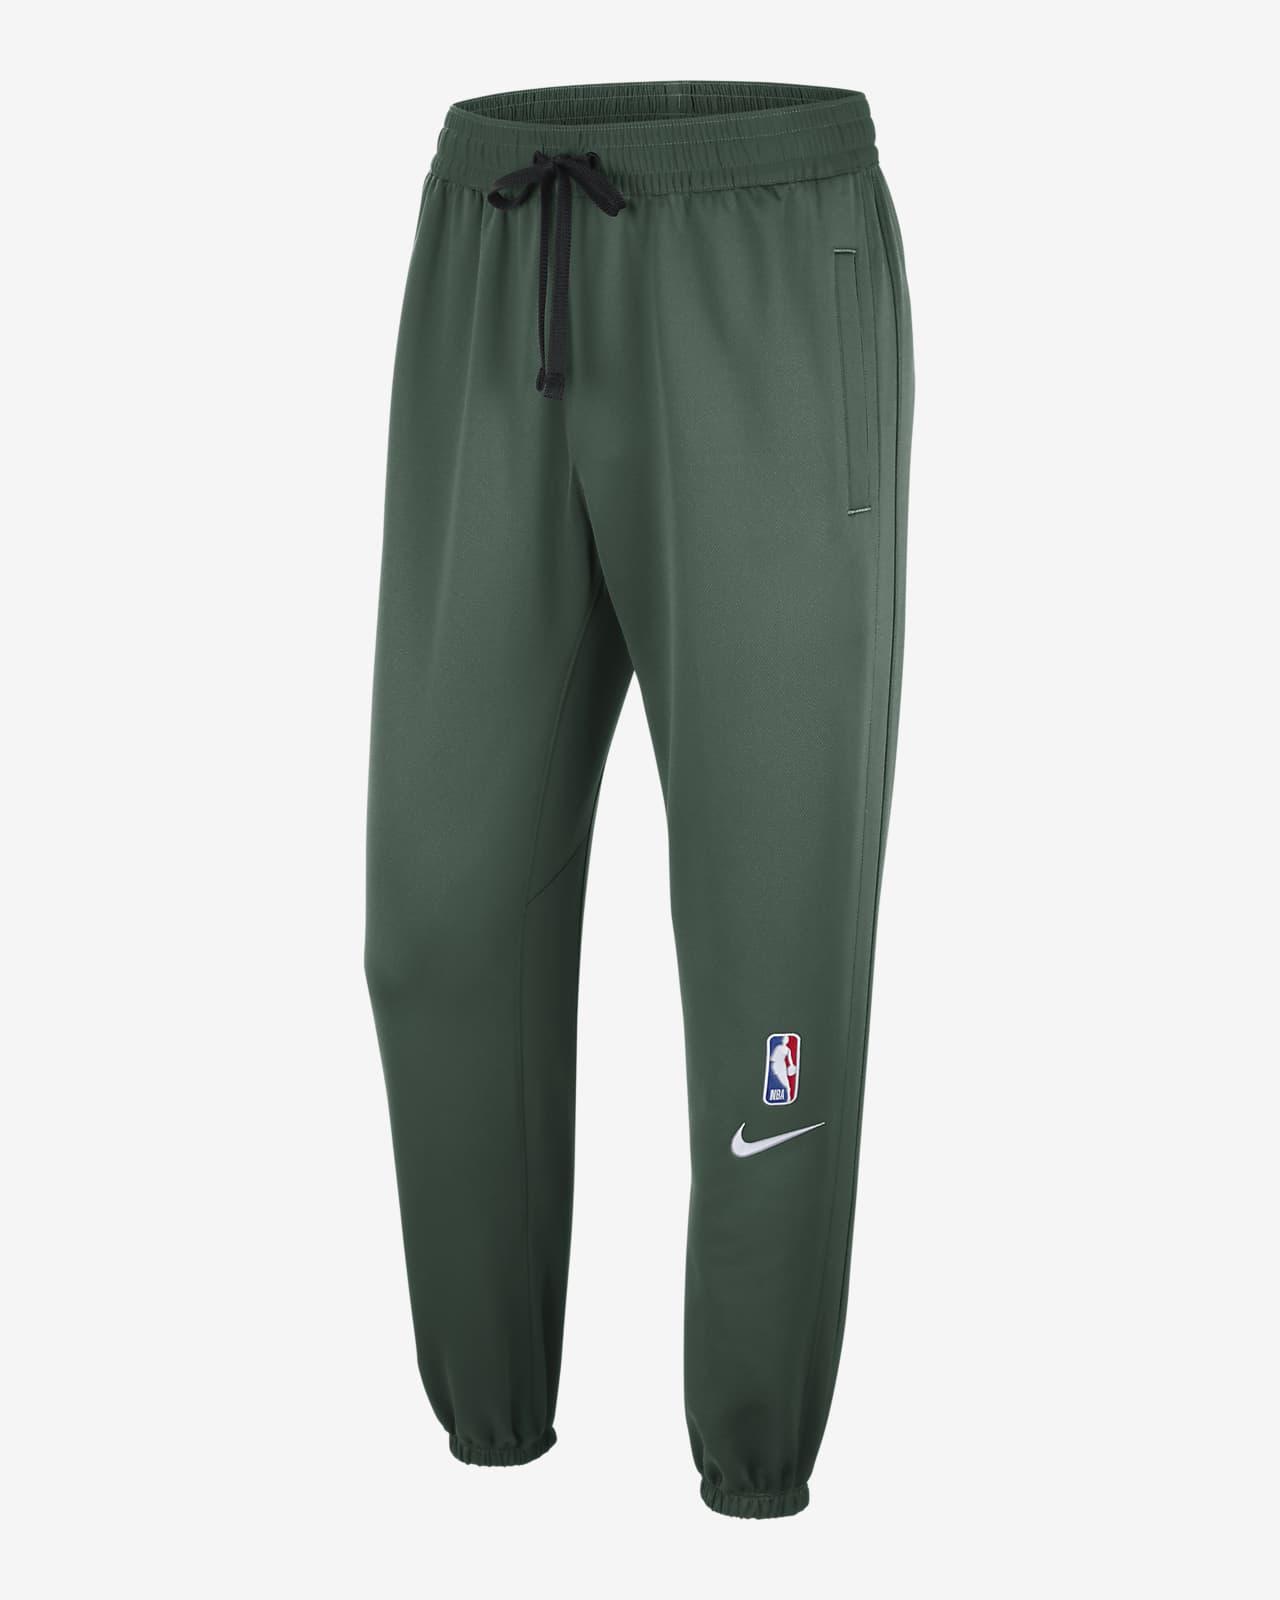 Pantalones de la NBA de Nike Therma Flex para hombre Milwaukee Bucks Showtime